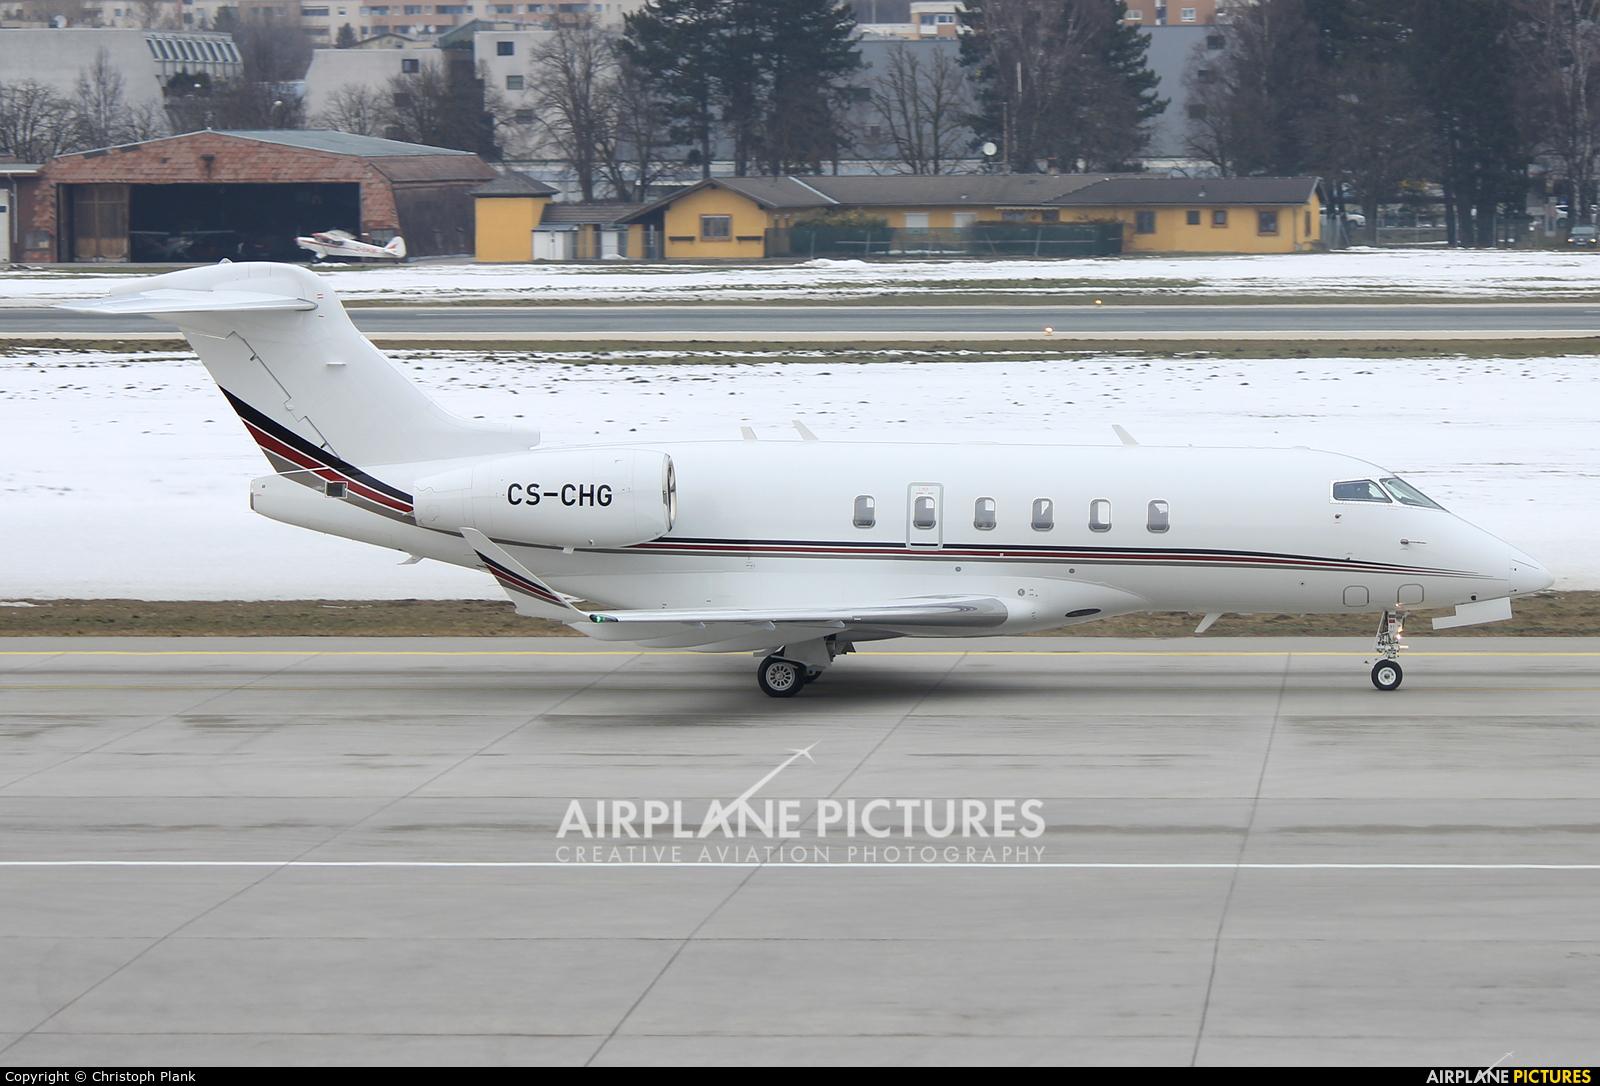 NetJets Europe (Portugal) CS-CHG aircraft at Innsbruck